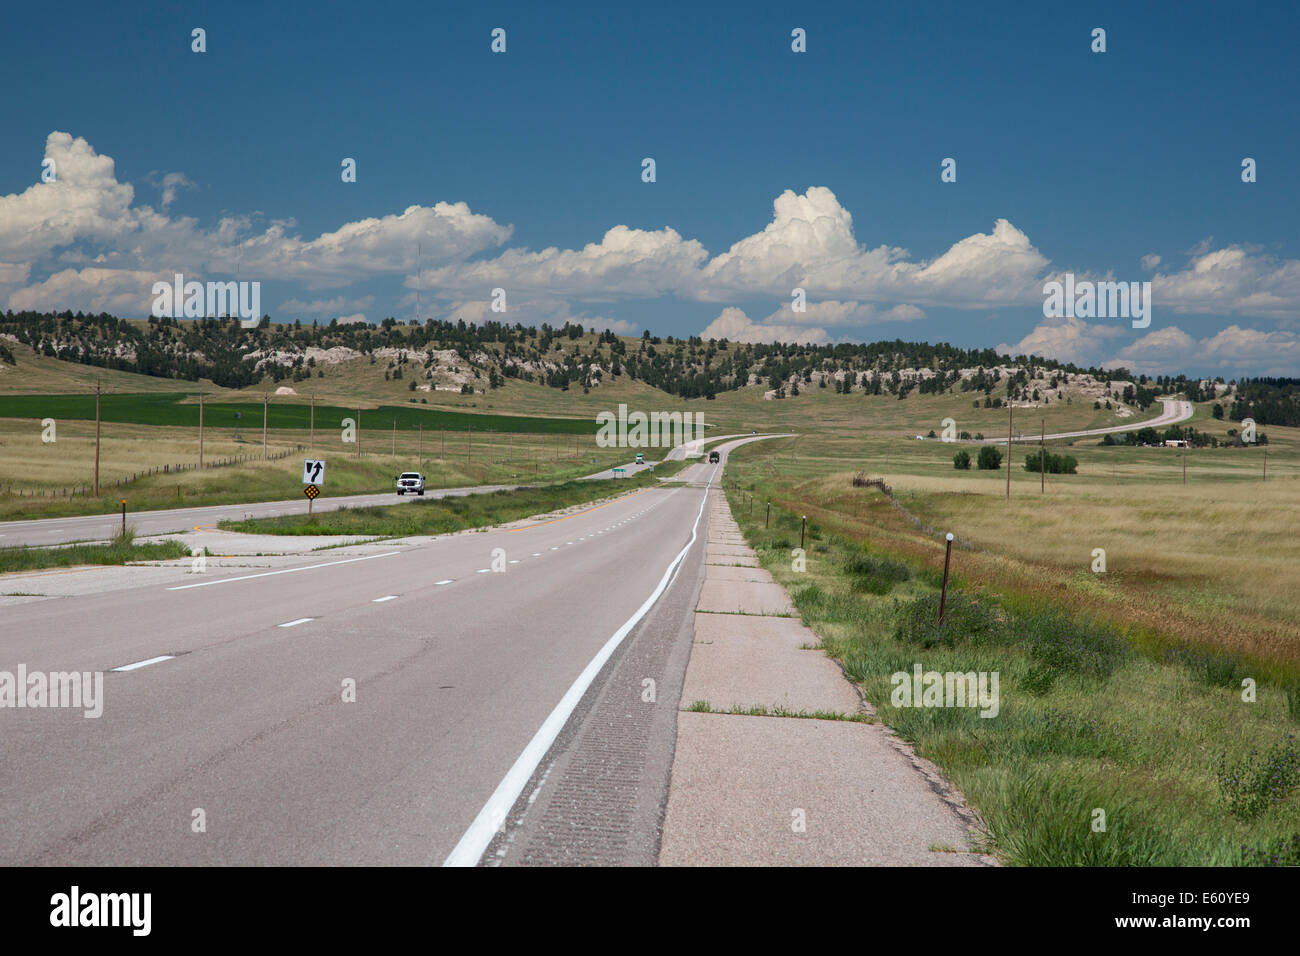 Harrisburg, Nebraska - Highway 71 in western Nebraska. Stock Photo